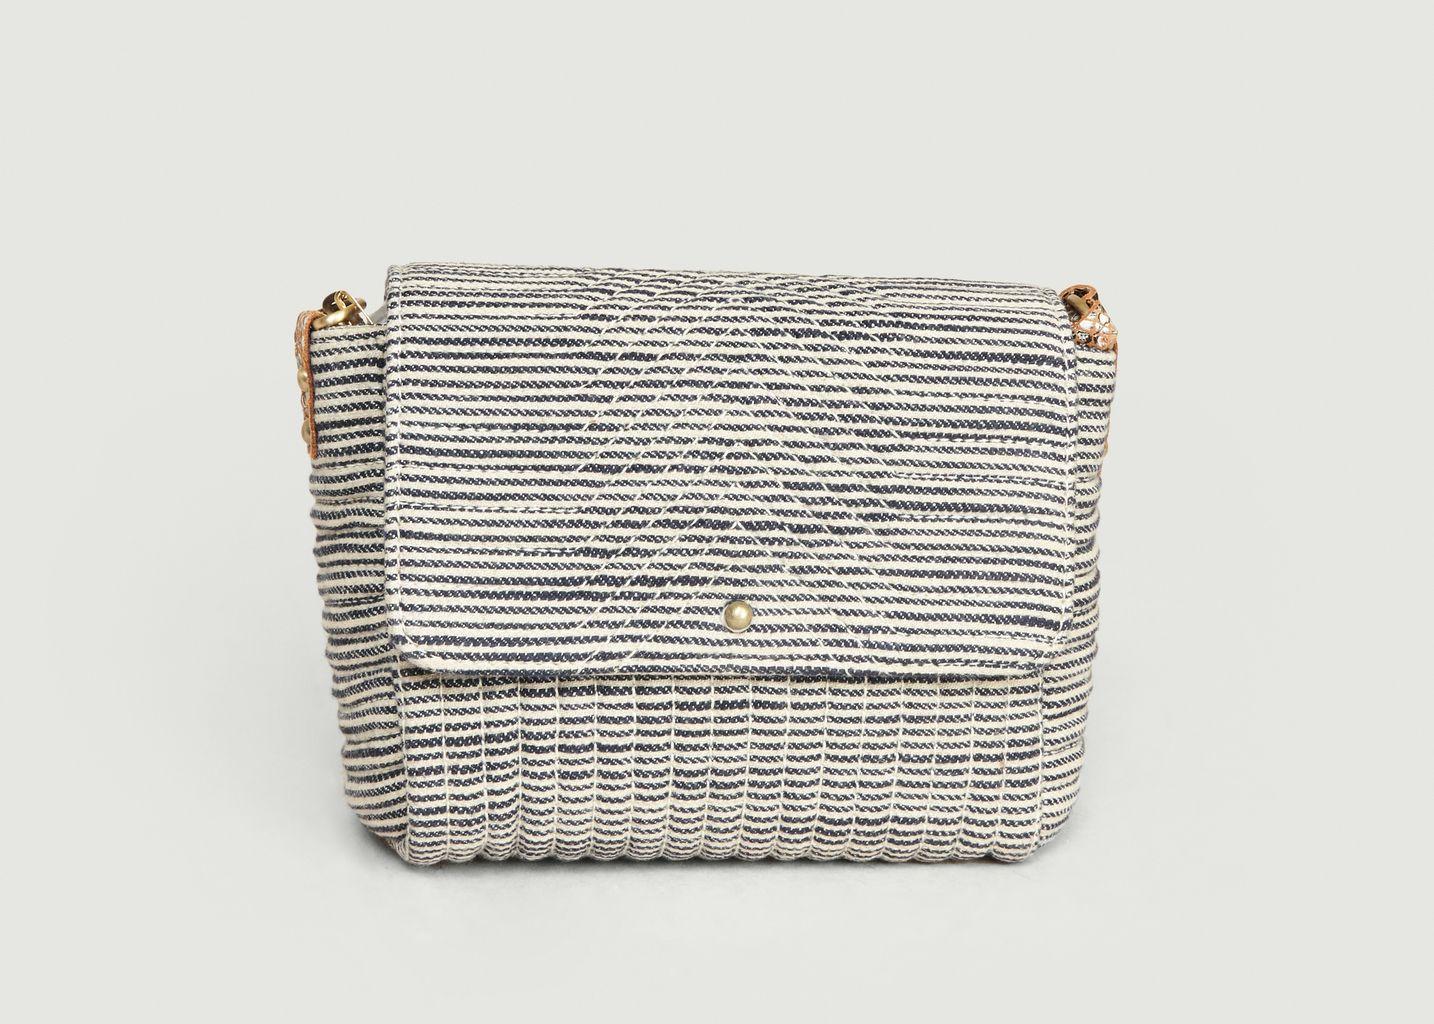 Petit sac en coton Joness Stripes - Sessun